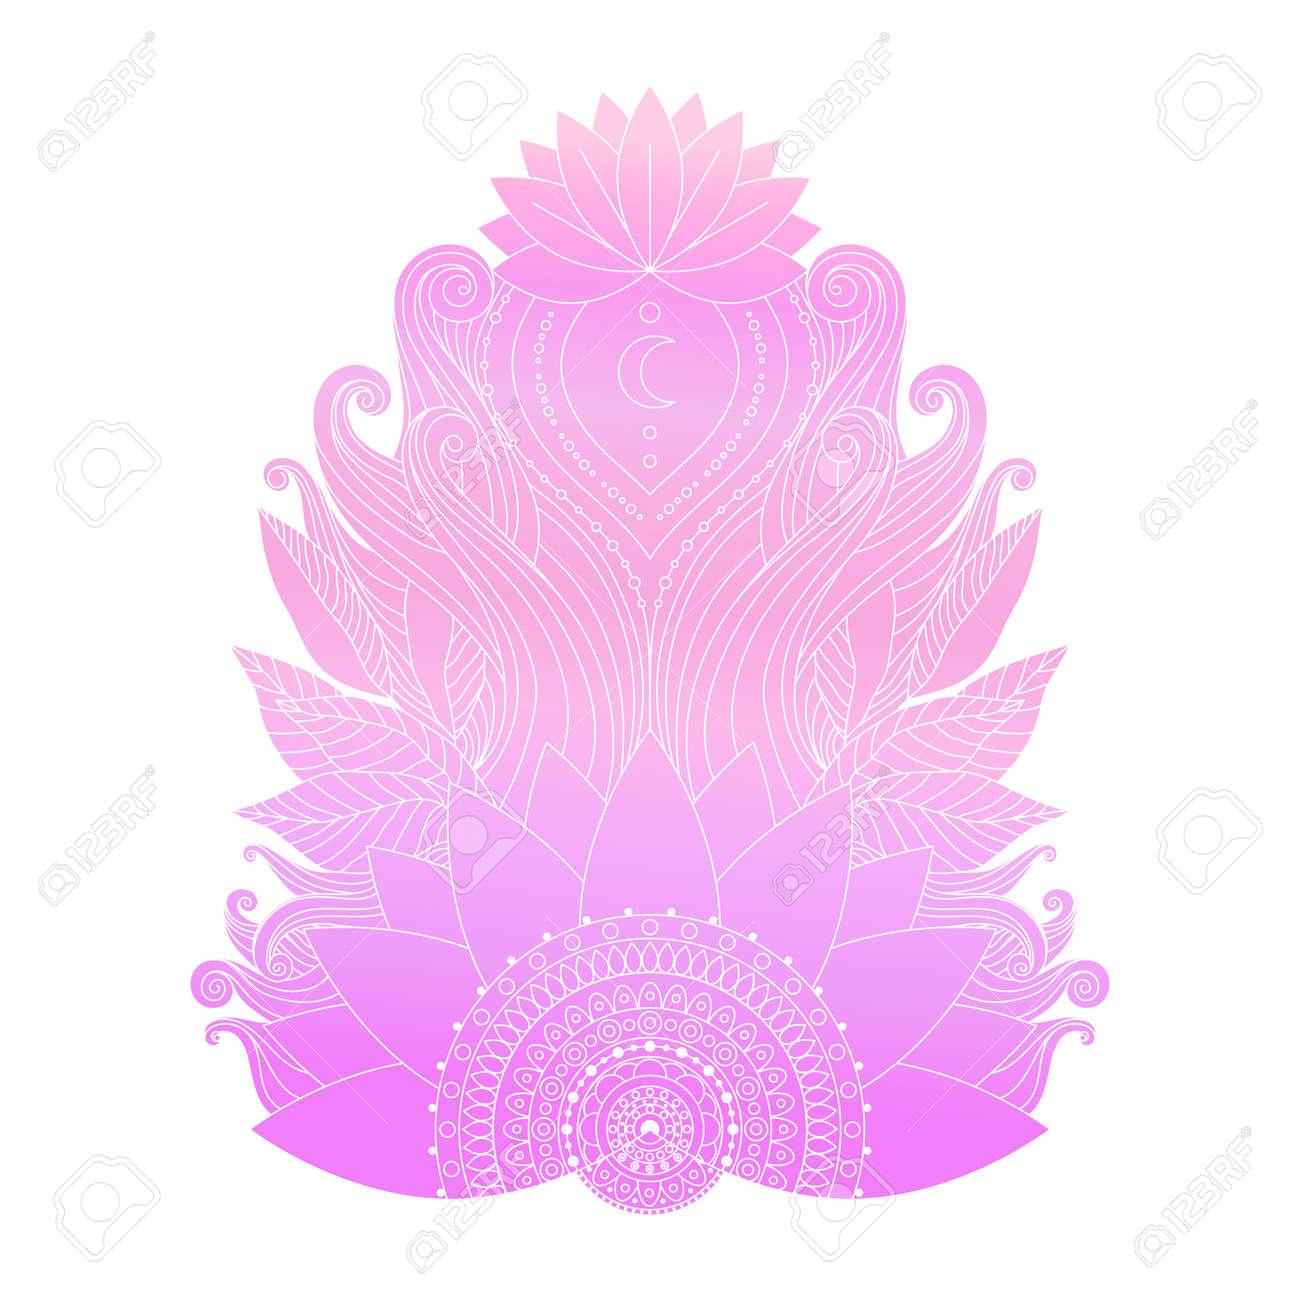 Spiritual Symbol Ornamental Cold Pink Lotus Flowers And Leaves